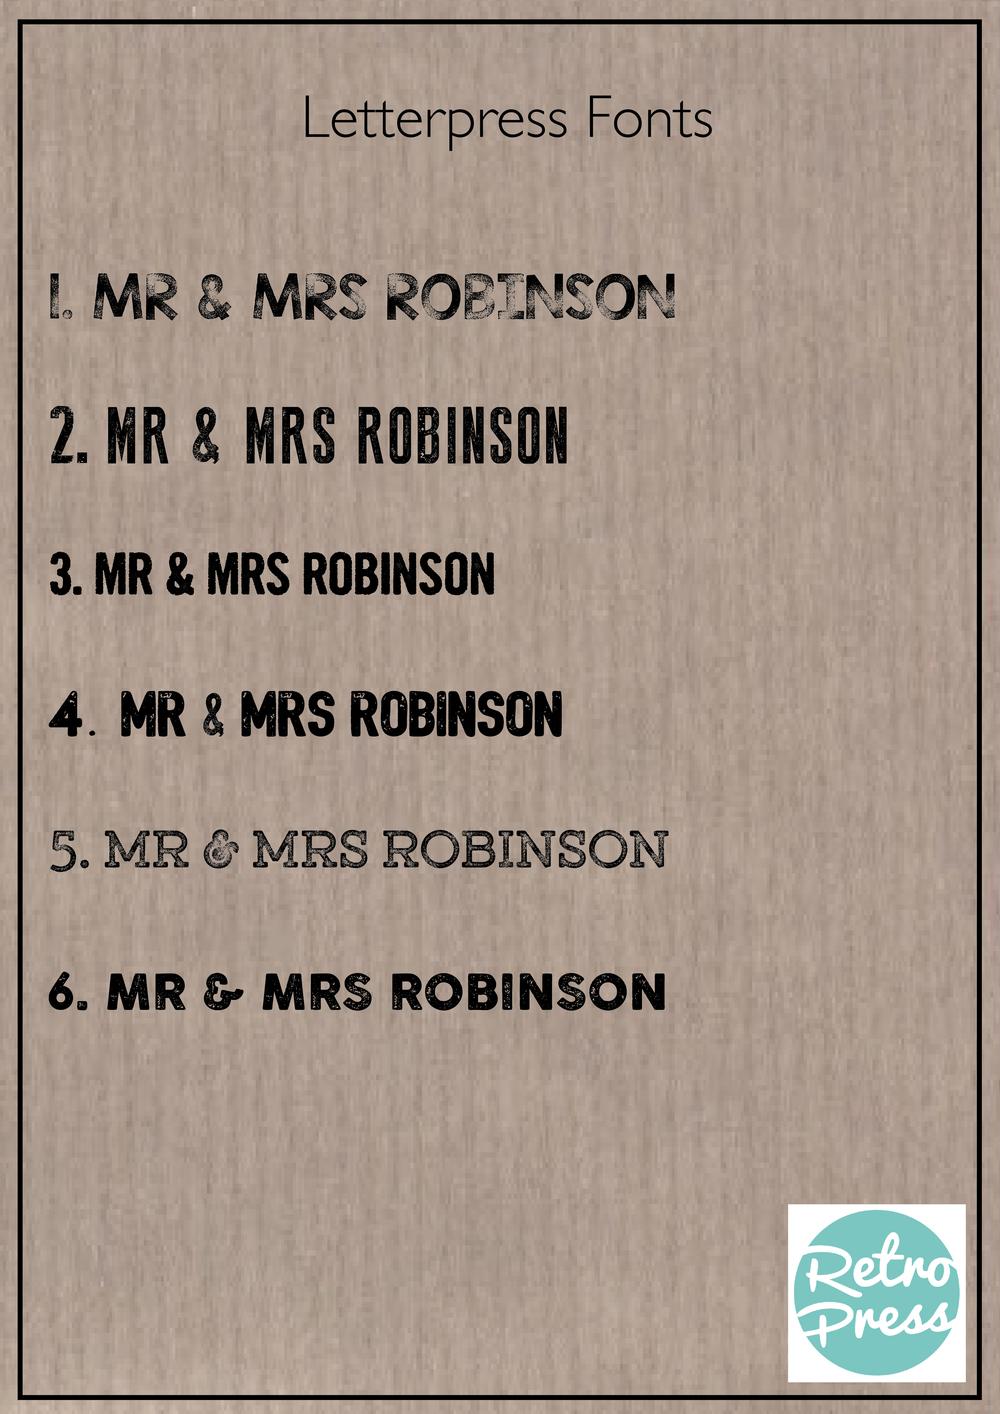 letterpress wedding fonts